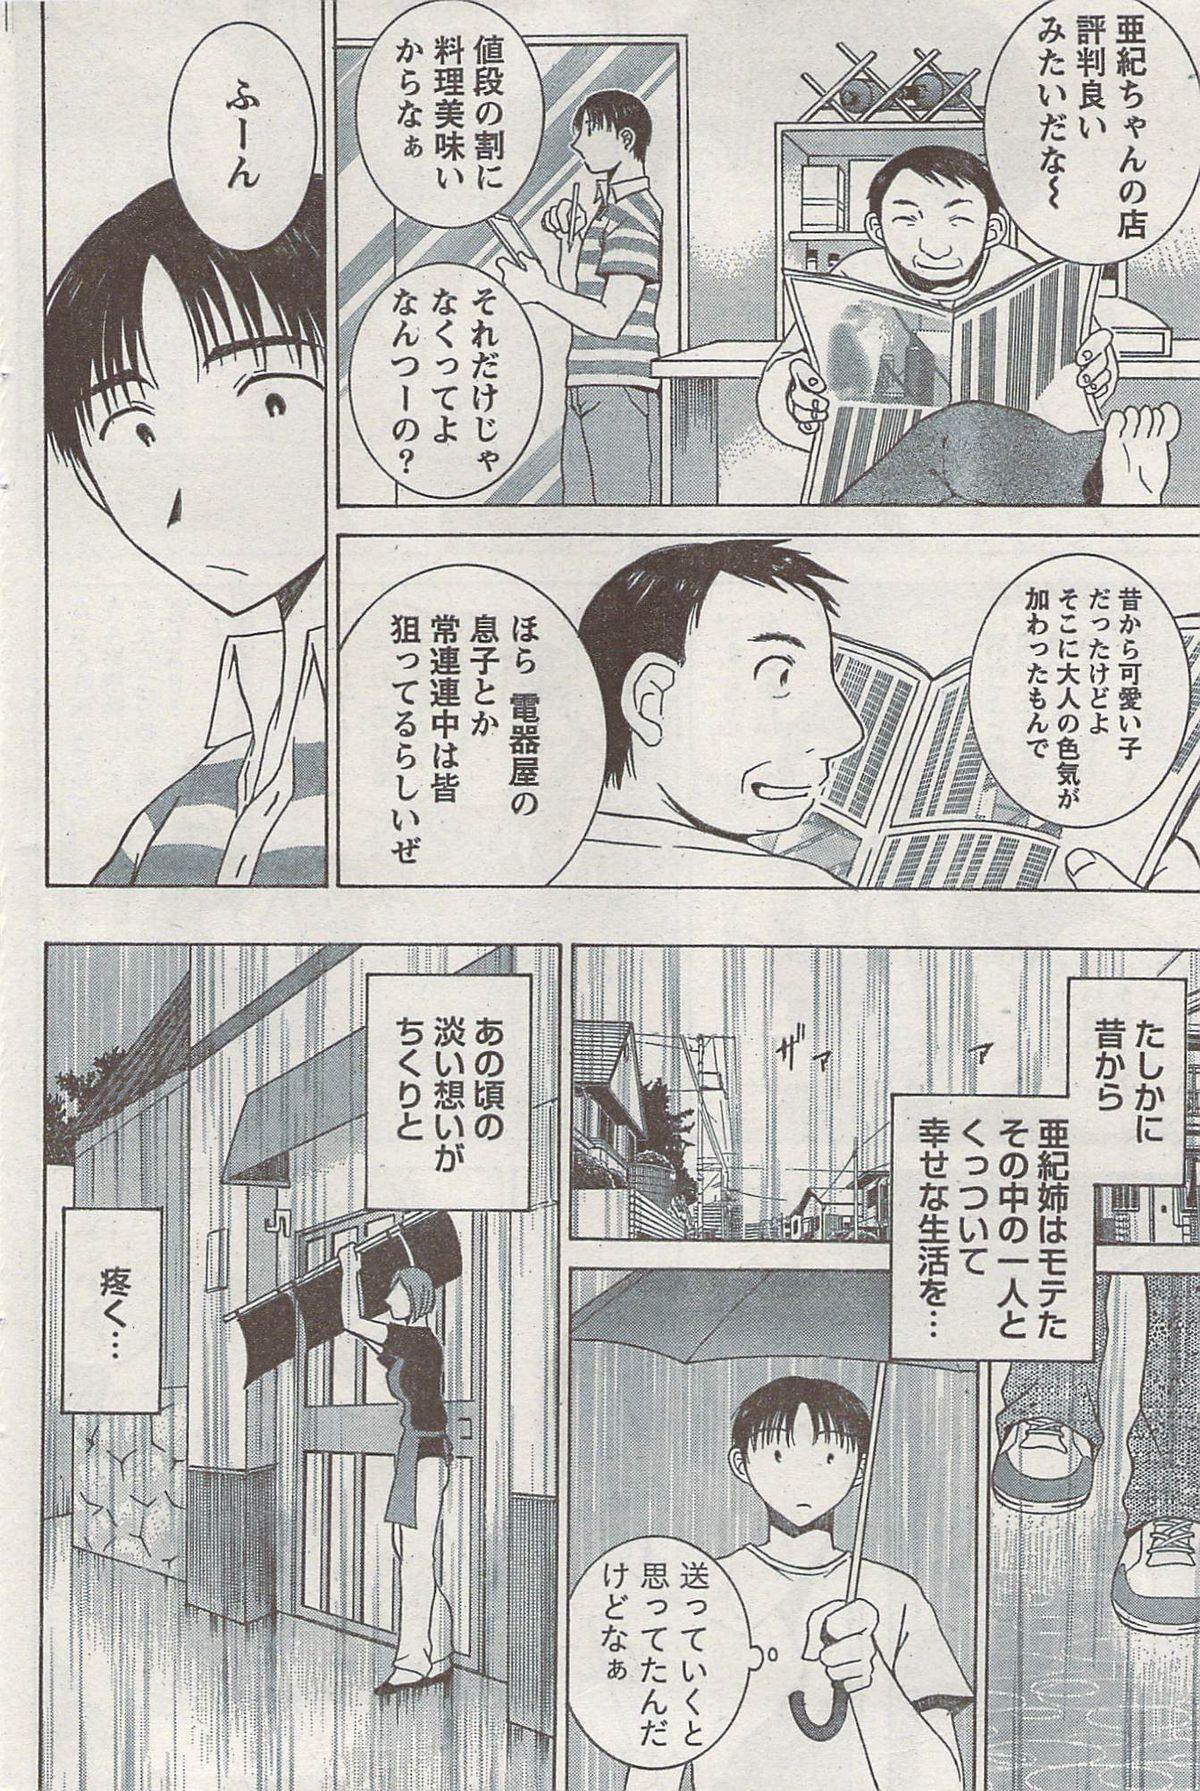 Monthly Vitaman 2007-08 97